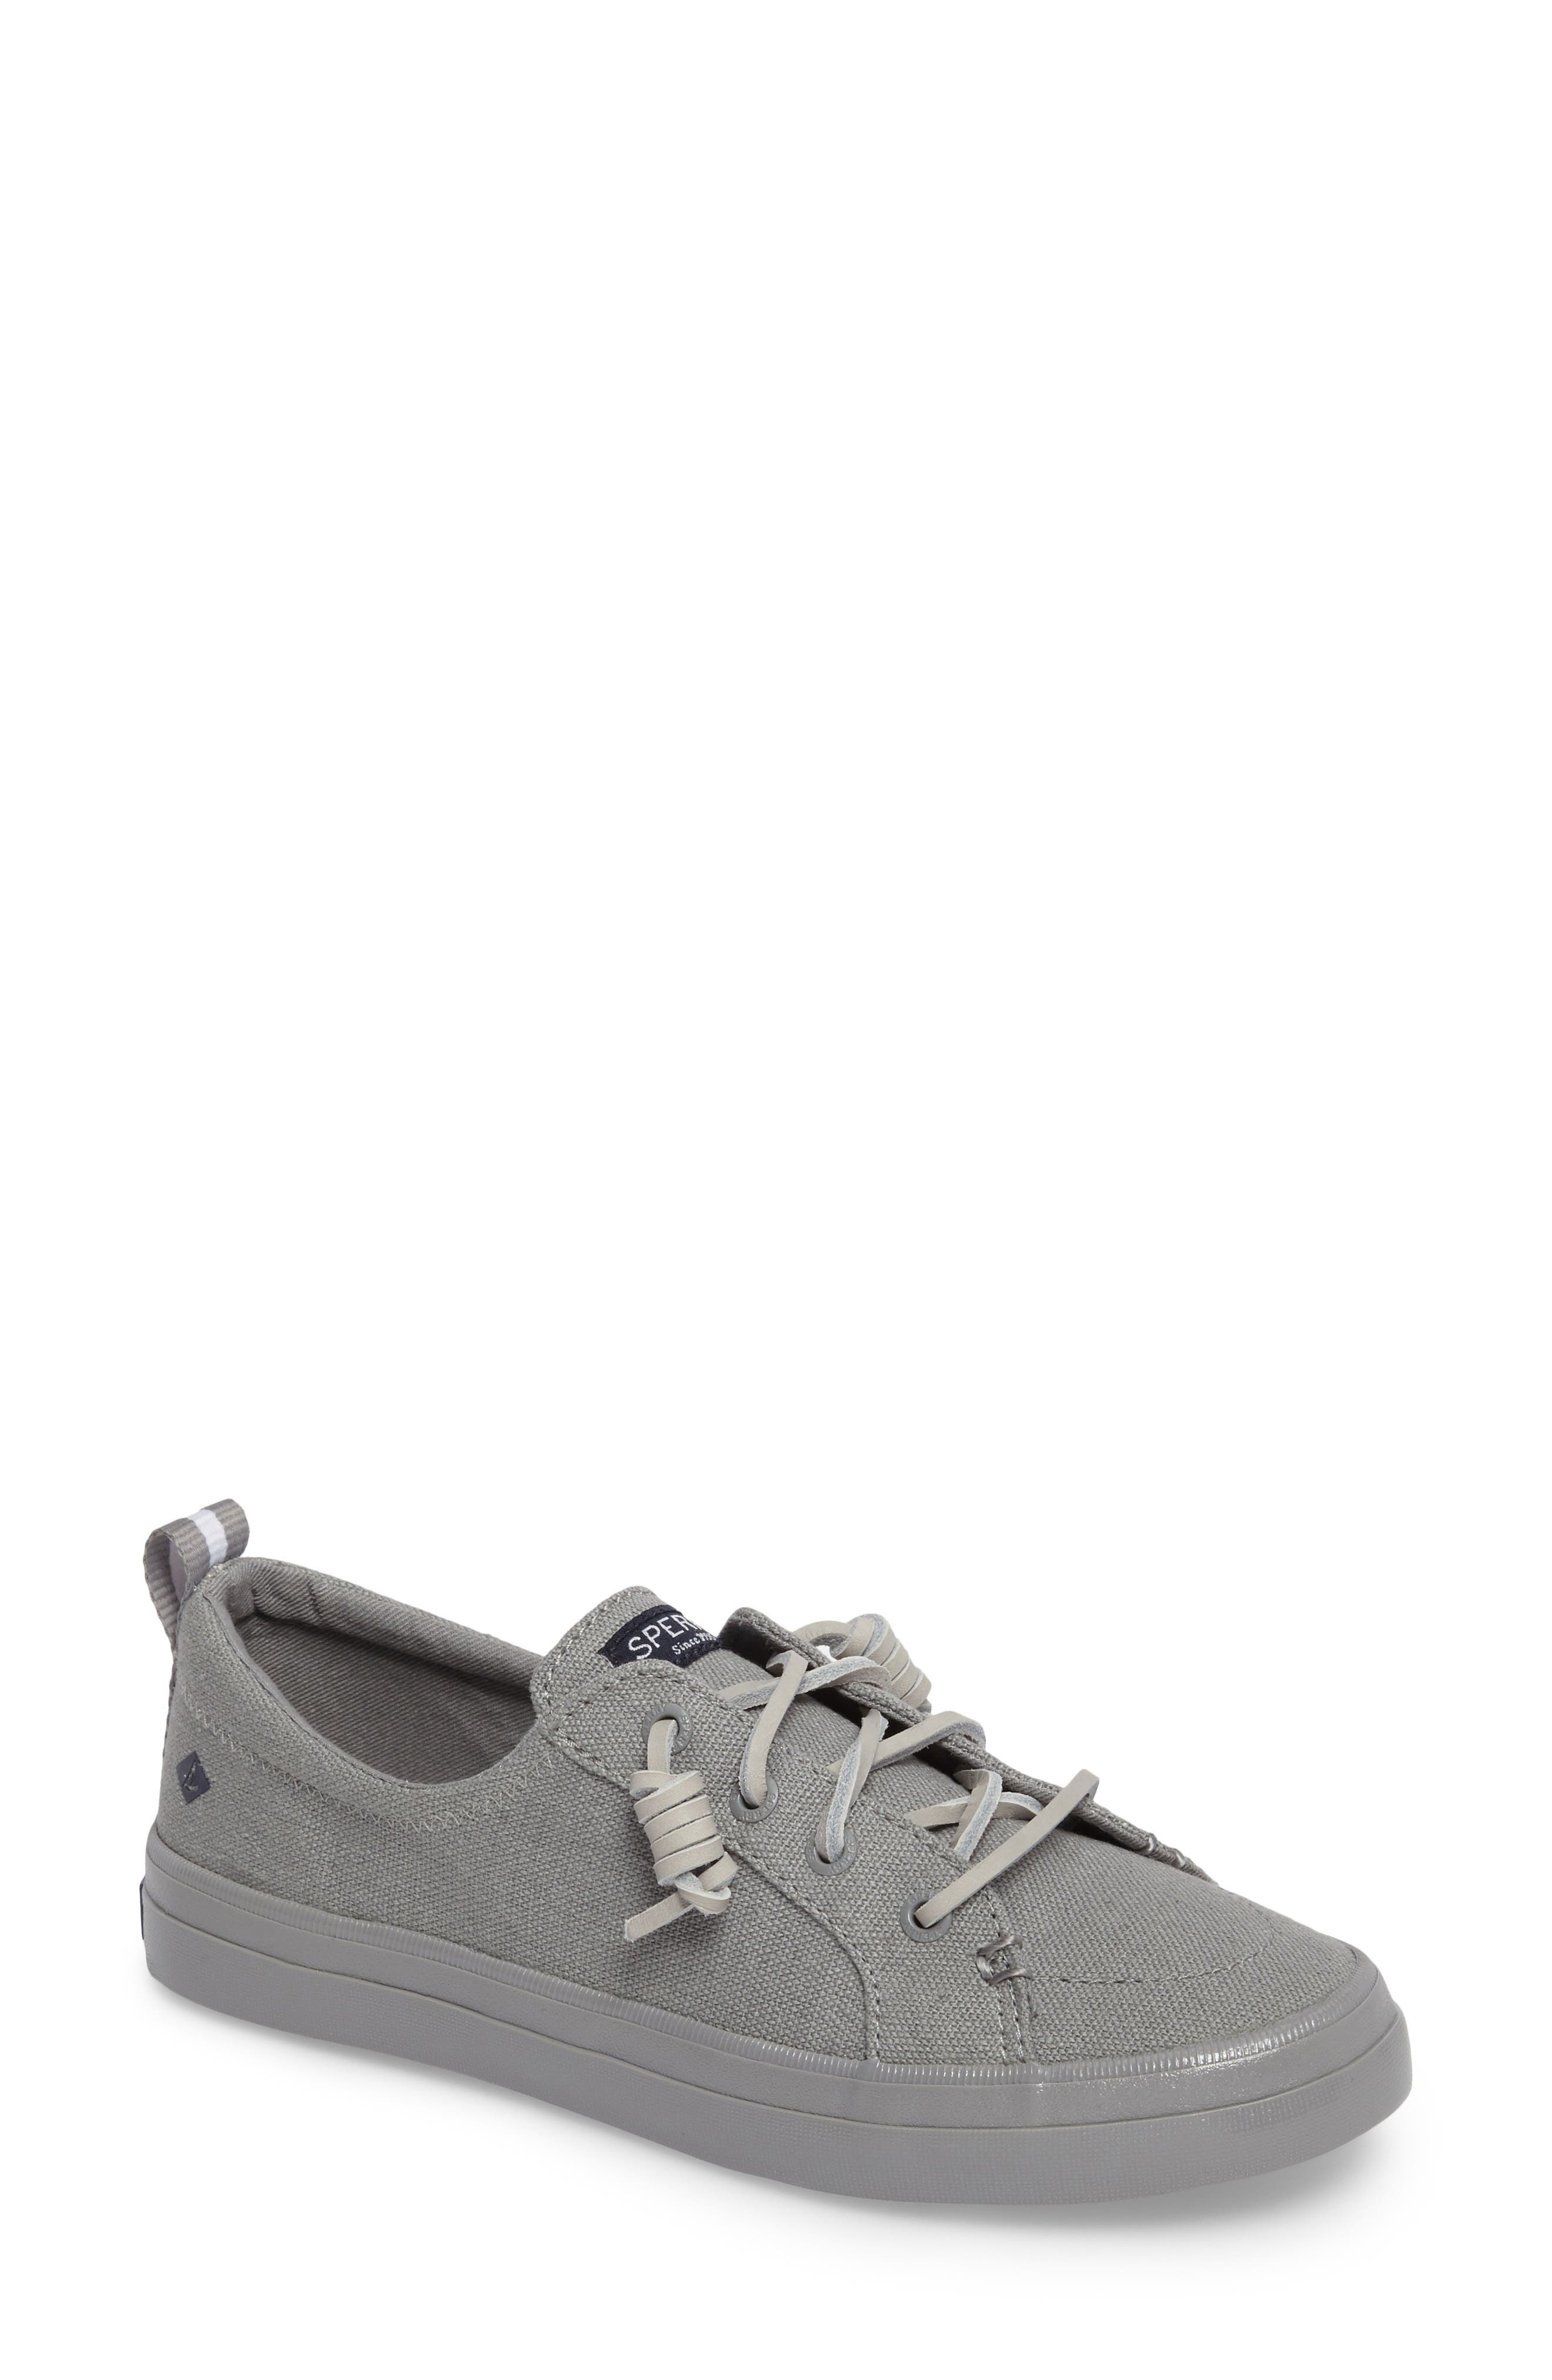 Alternate Image 1 Selected - Sperry Crest Vibe Sneaker (Women)